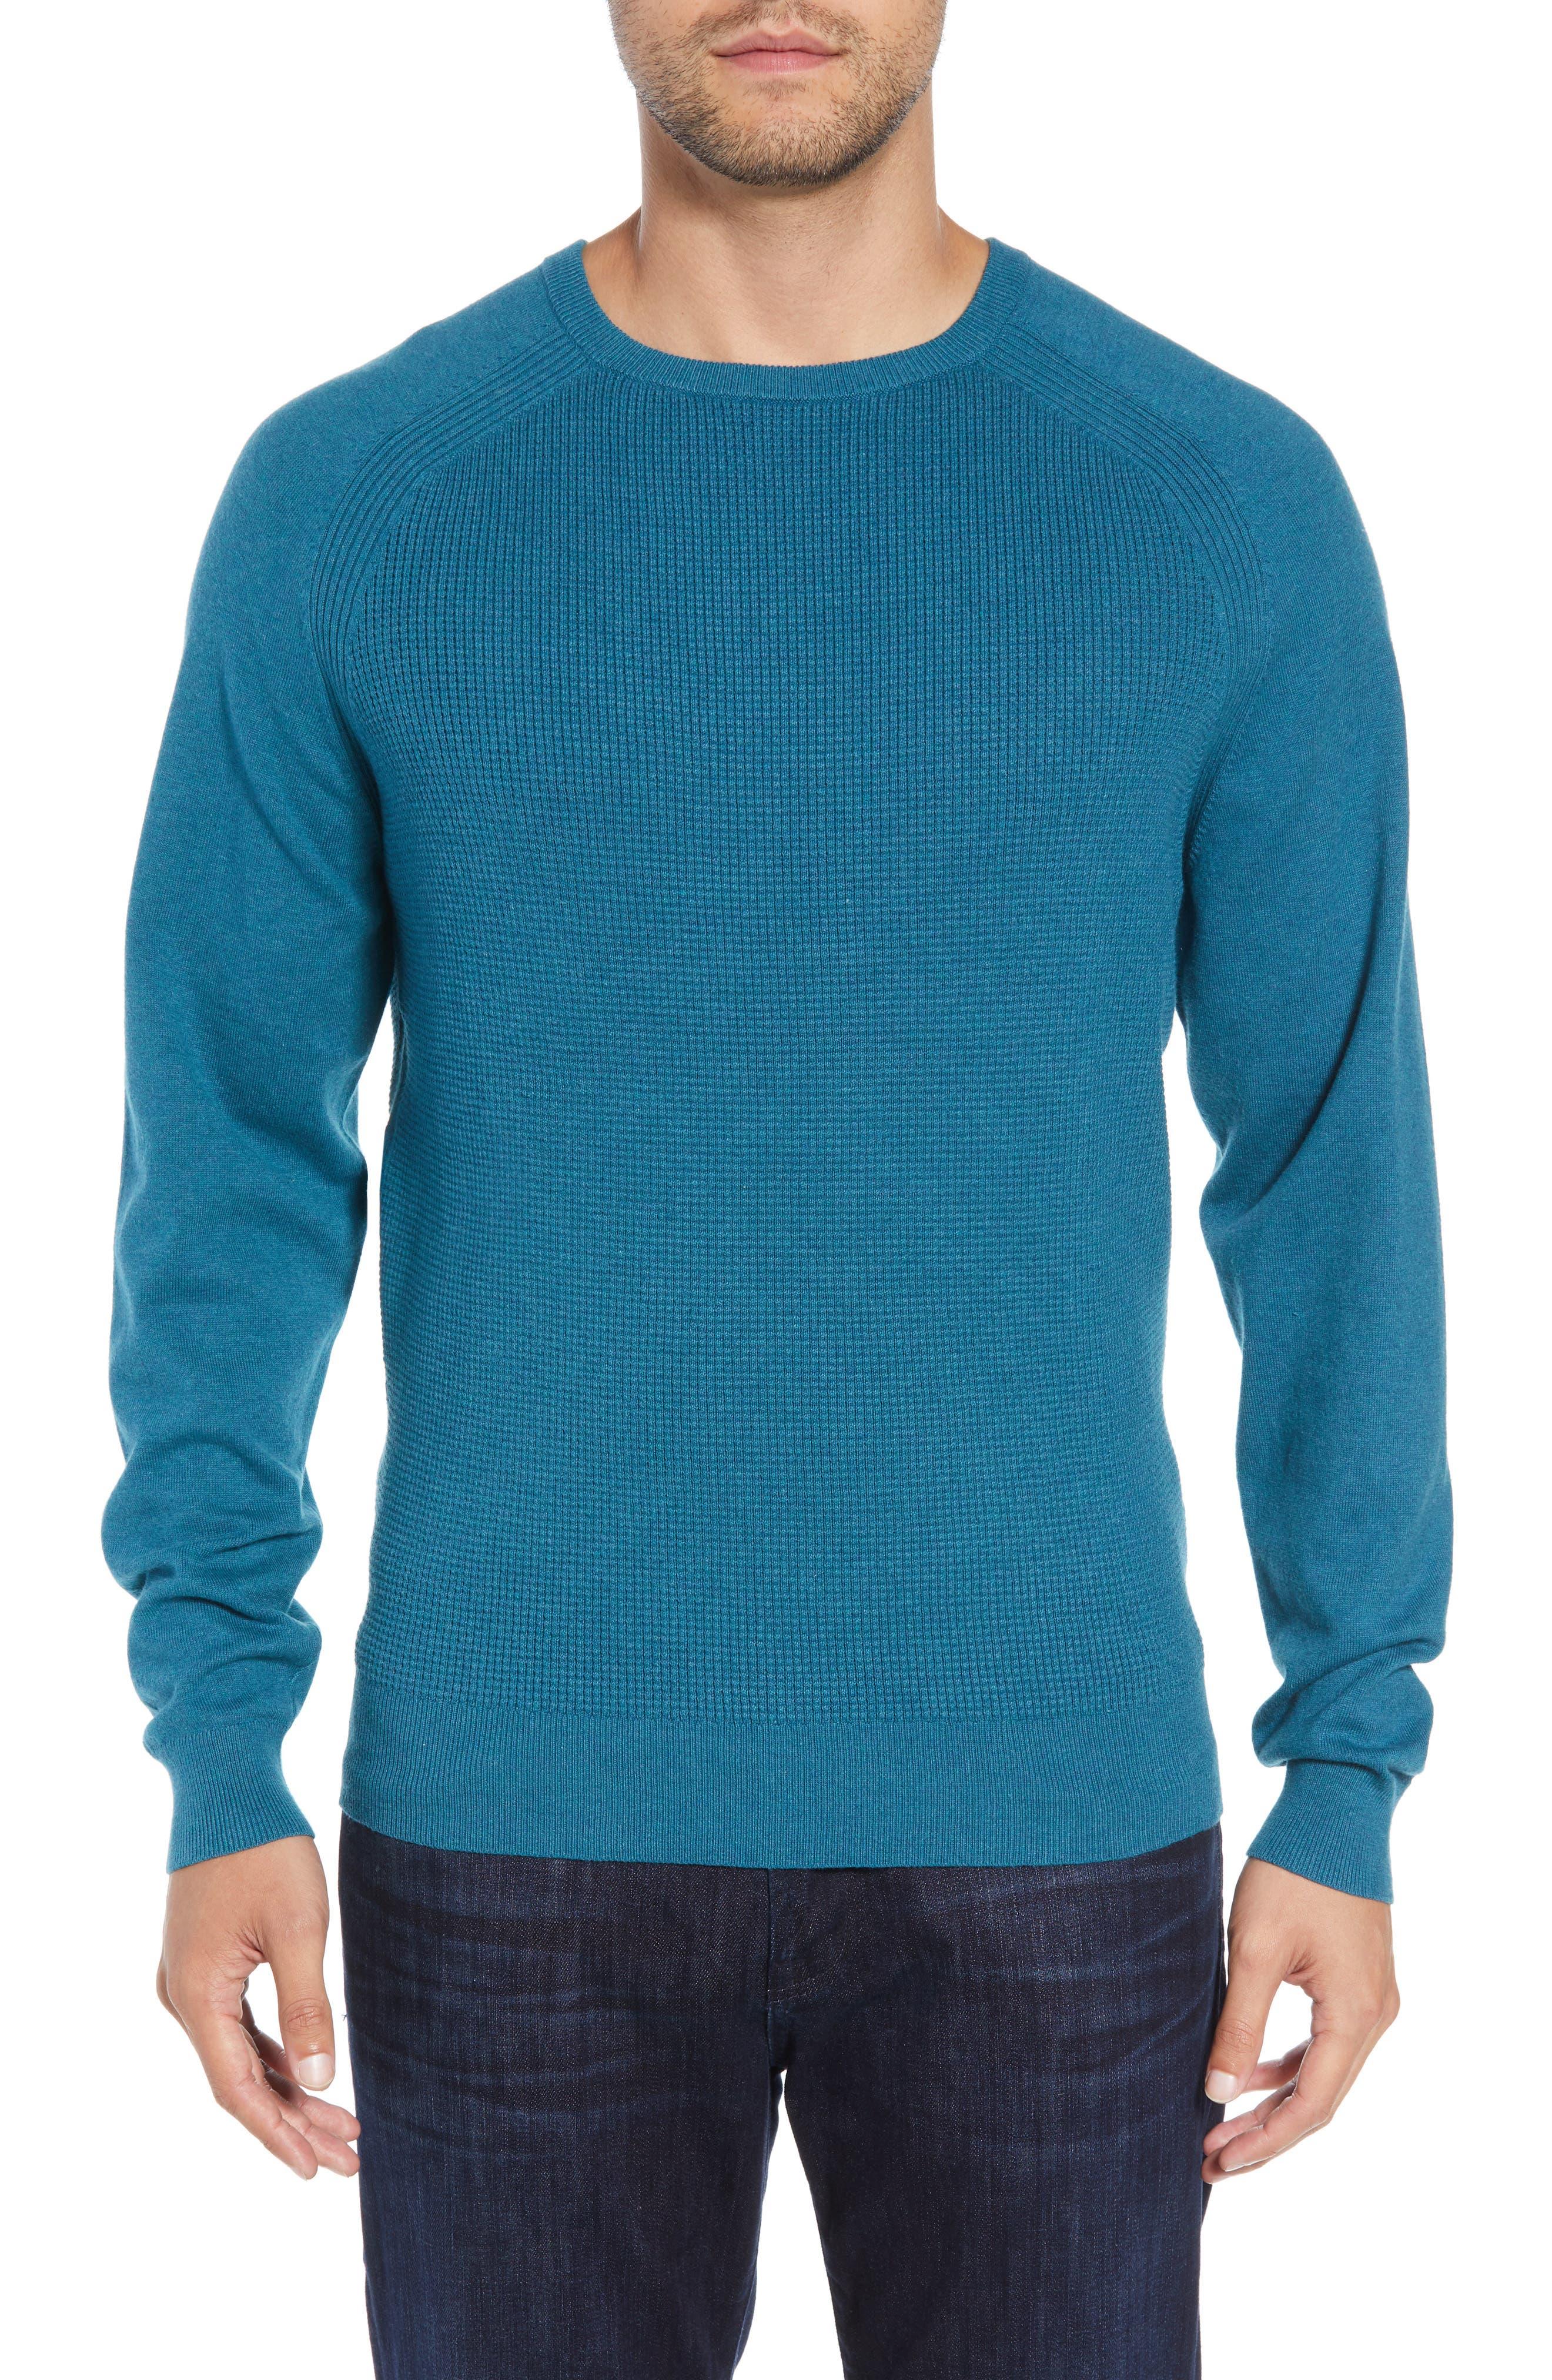 Cutter & Buck Lakemon Mix Crewneck Sweater, Blue